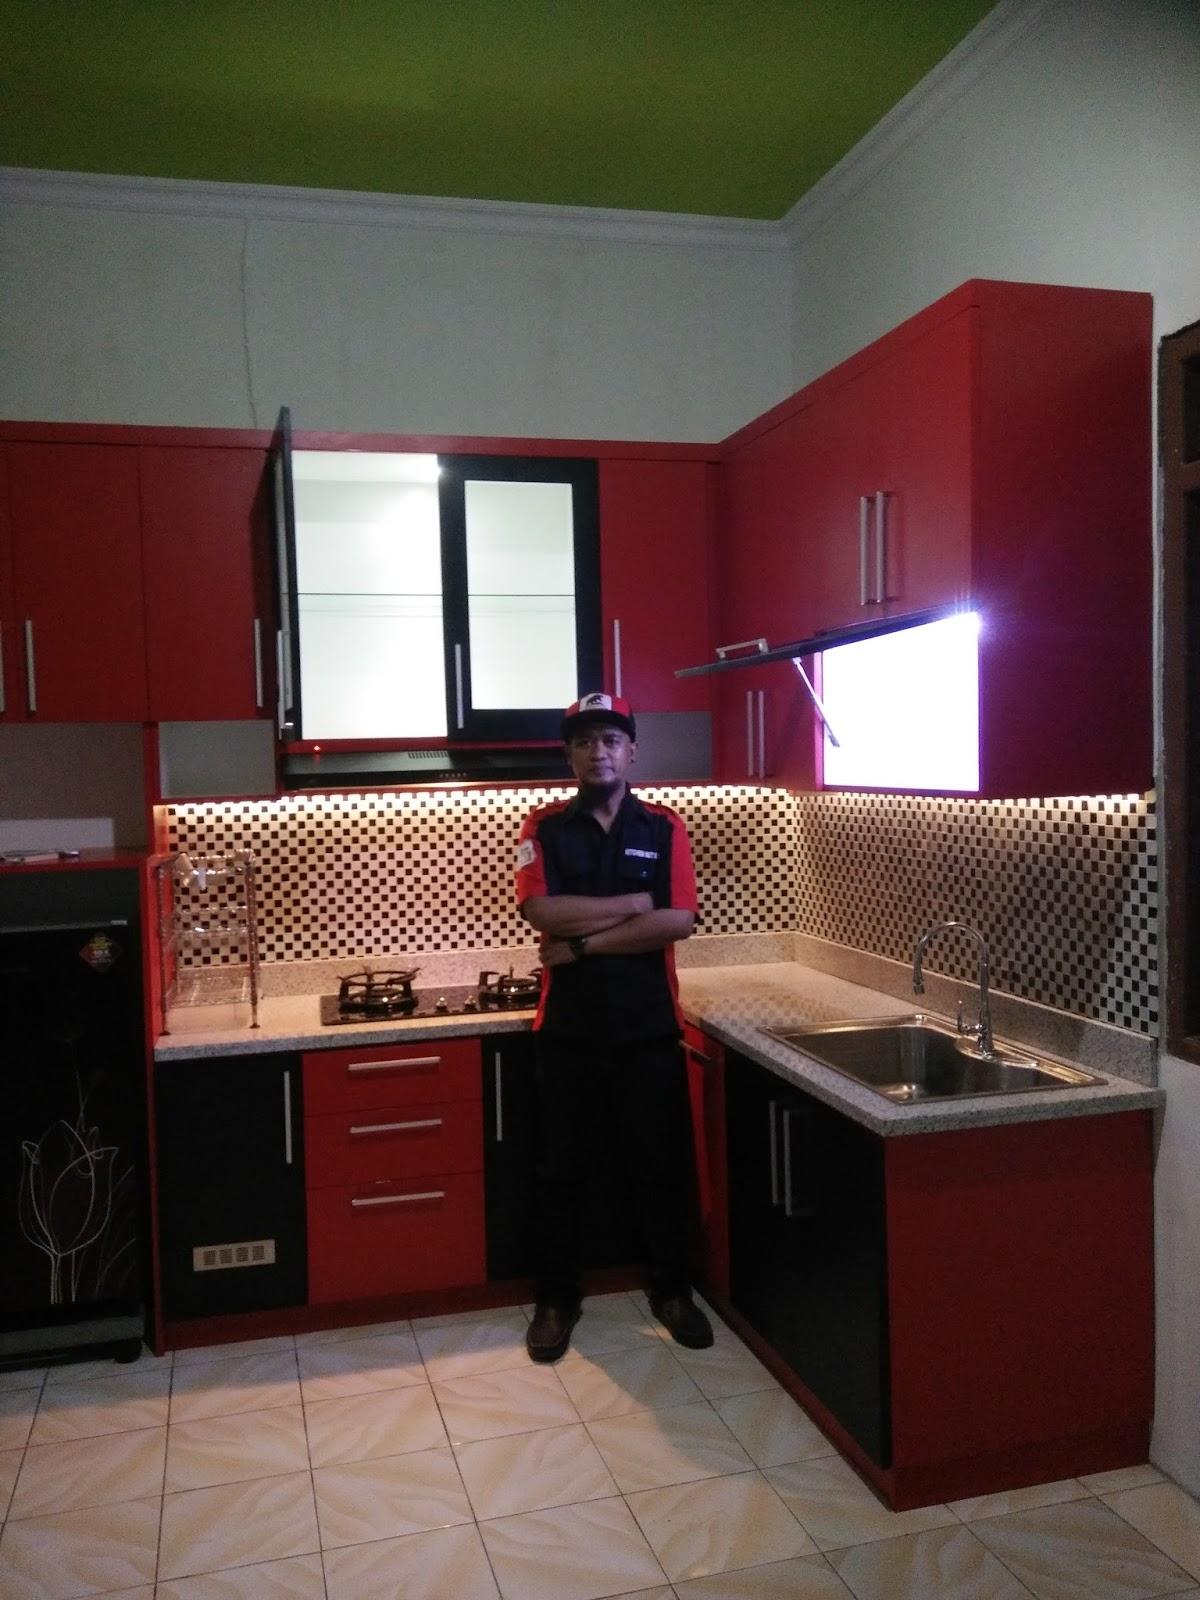 081215005567,wa 085733377944,kitchen Set Jogja,kitchen Set Murah Di Jogja,kitchen  Set Minimalis Di Jogja,harga Kitchen Set Di Jogja,harga Kitchen Set Di ...